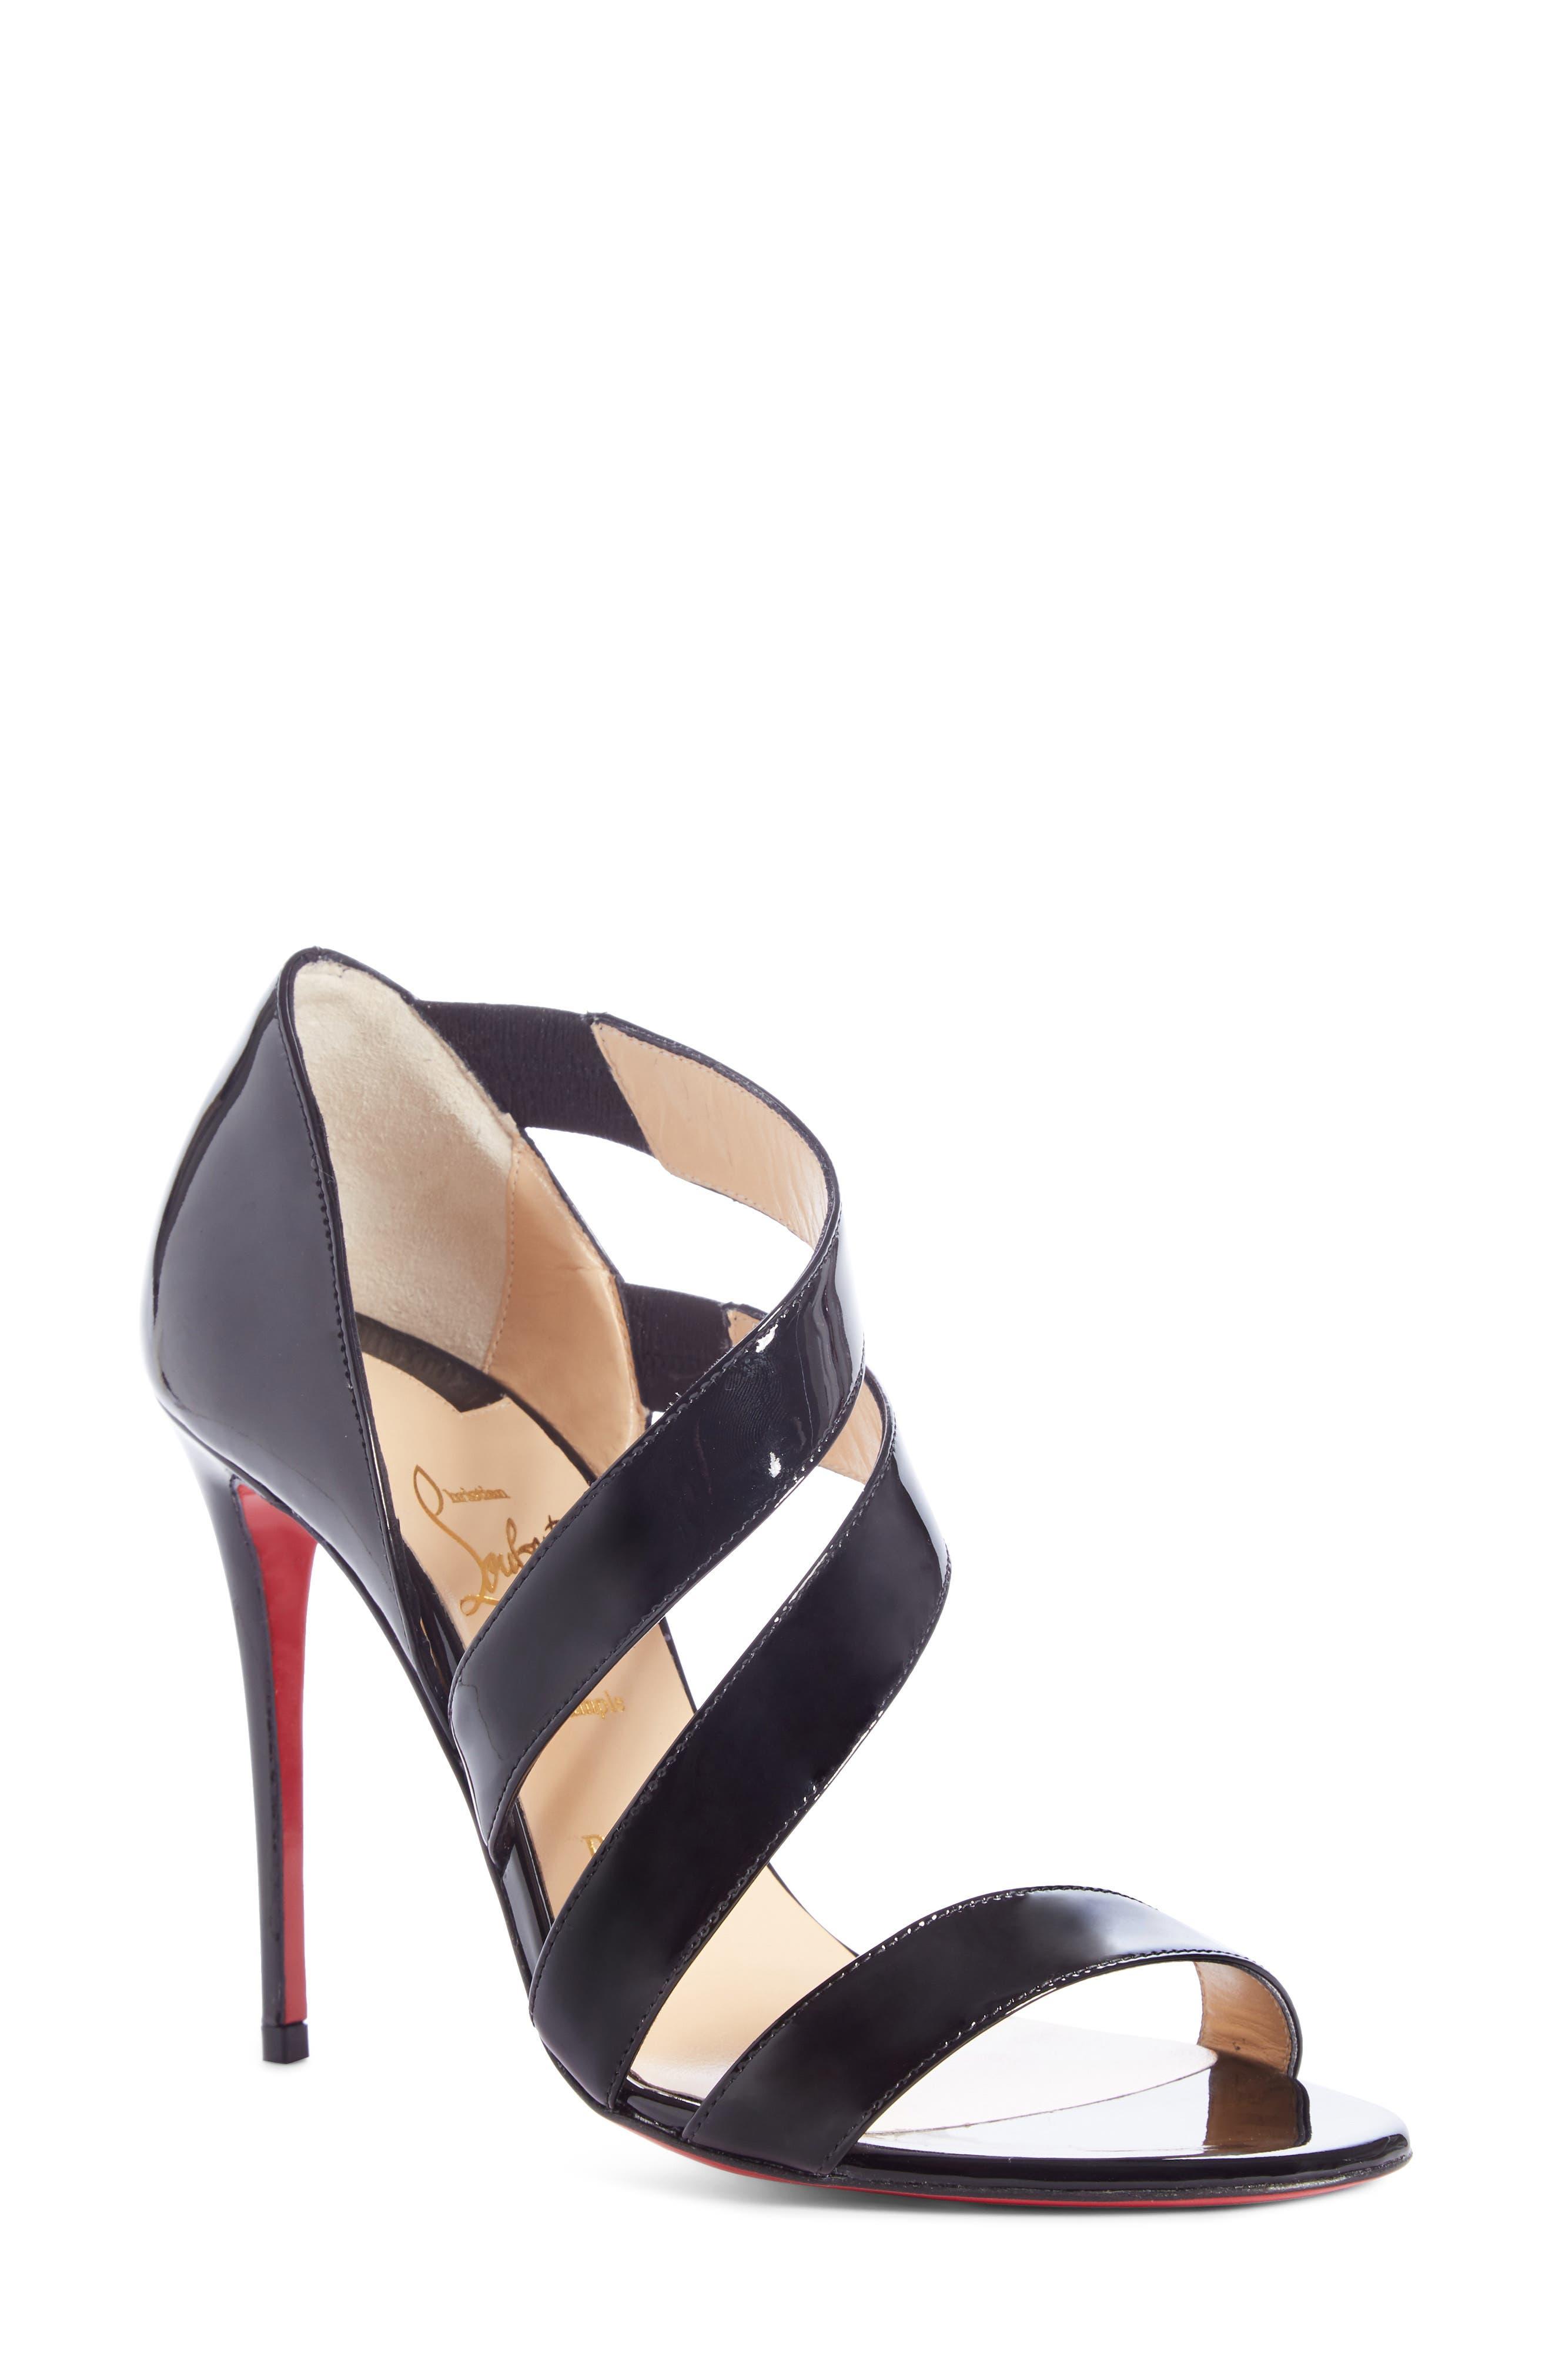 CHRISTIAN LOUBOUTIN, World Copine Asymmetrical Sandal, Main thumbnail 1, color, BLACK PATENT